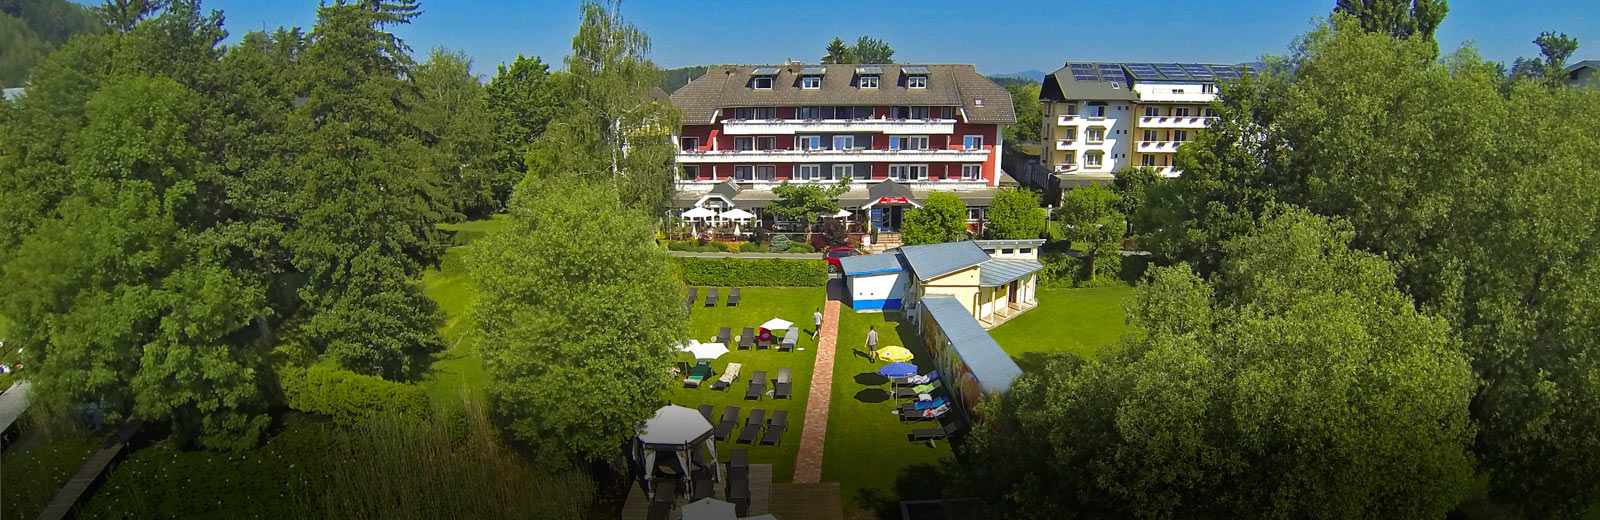 hotel-strand-wiese520